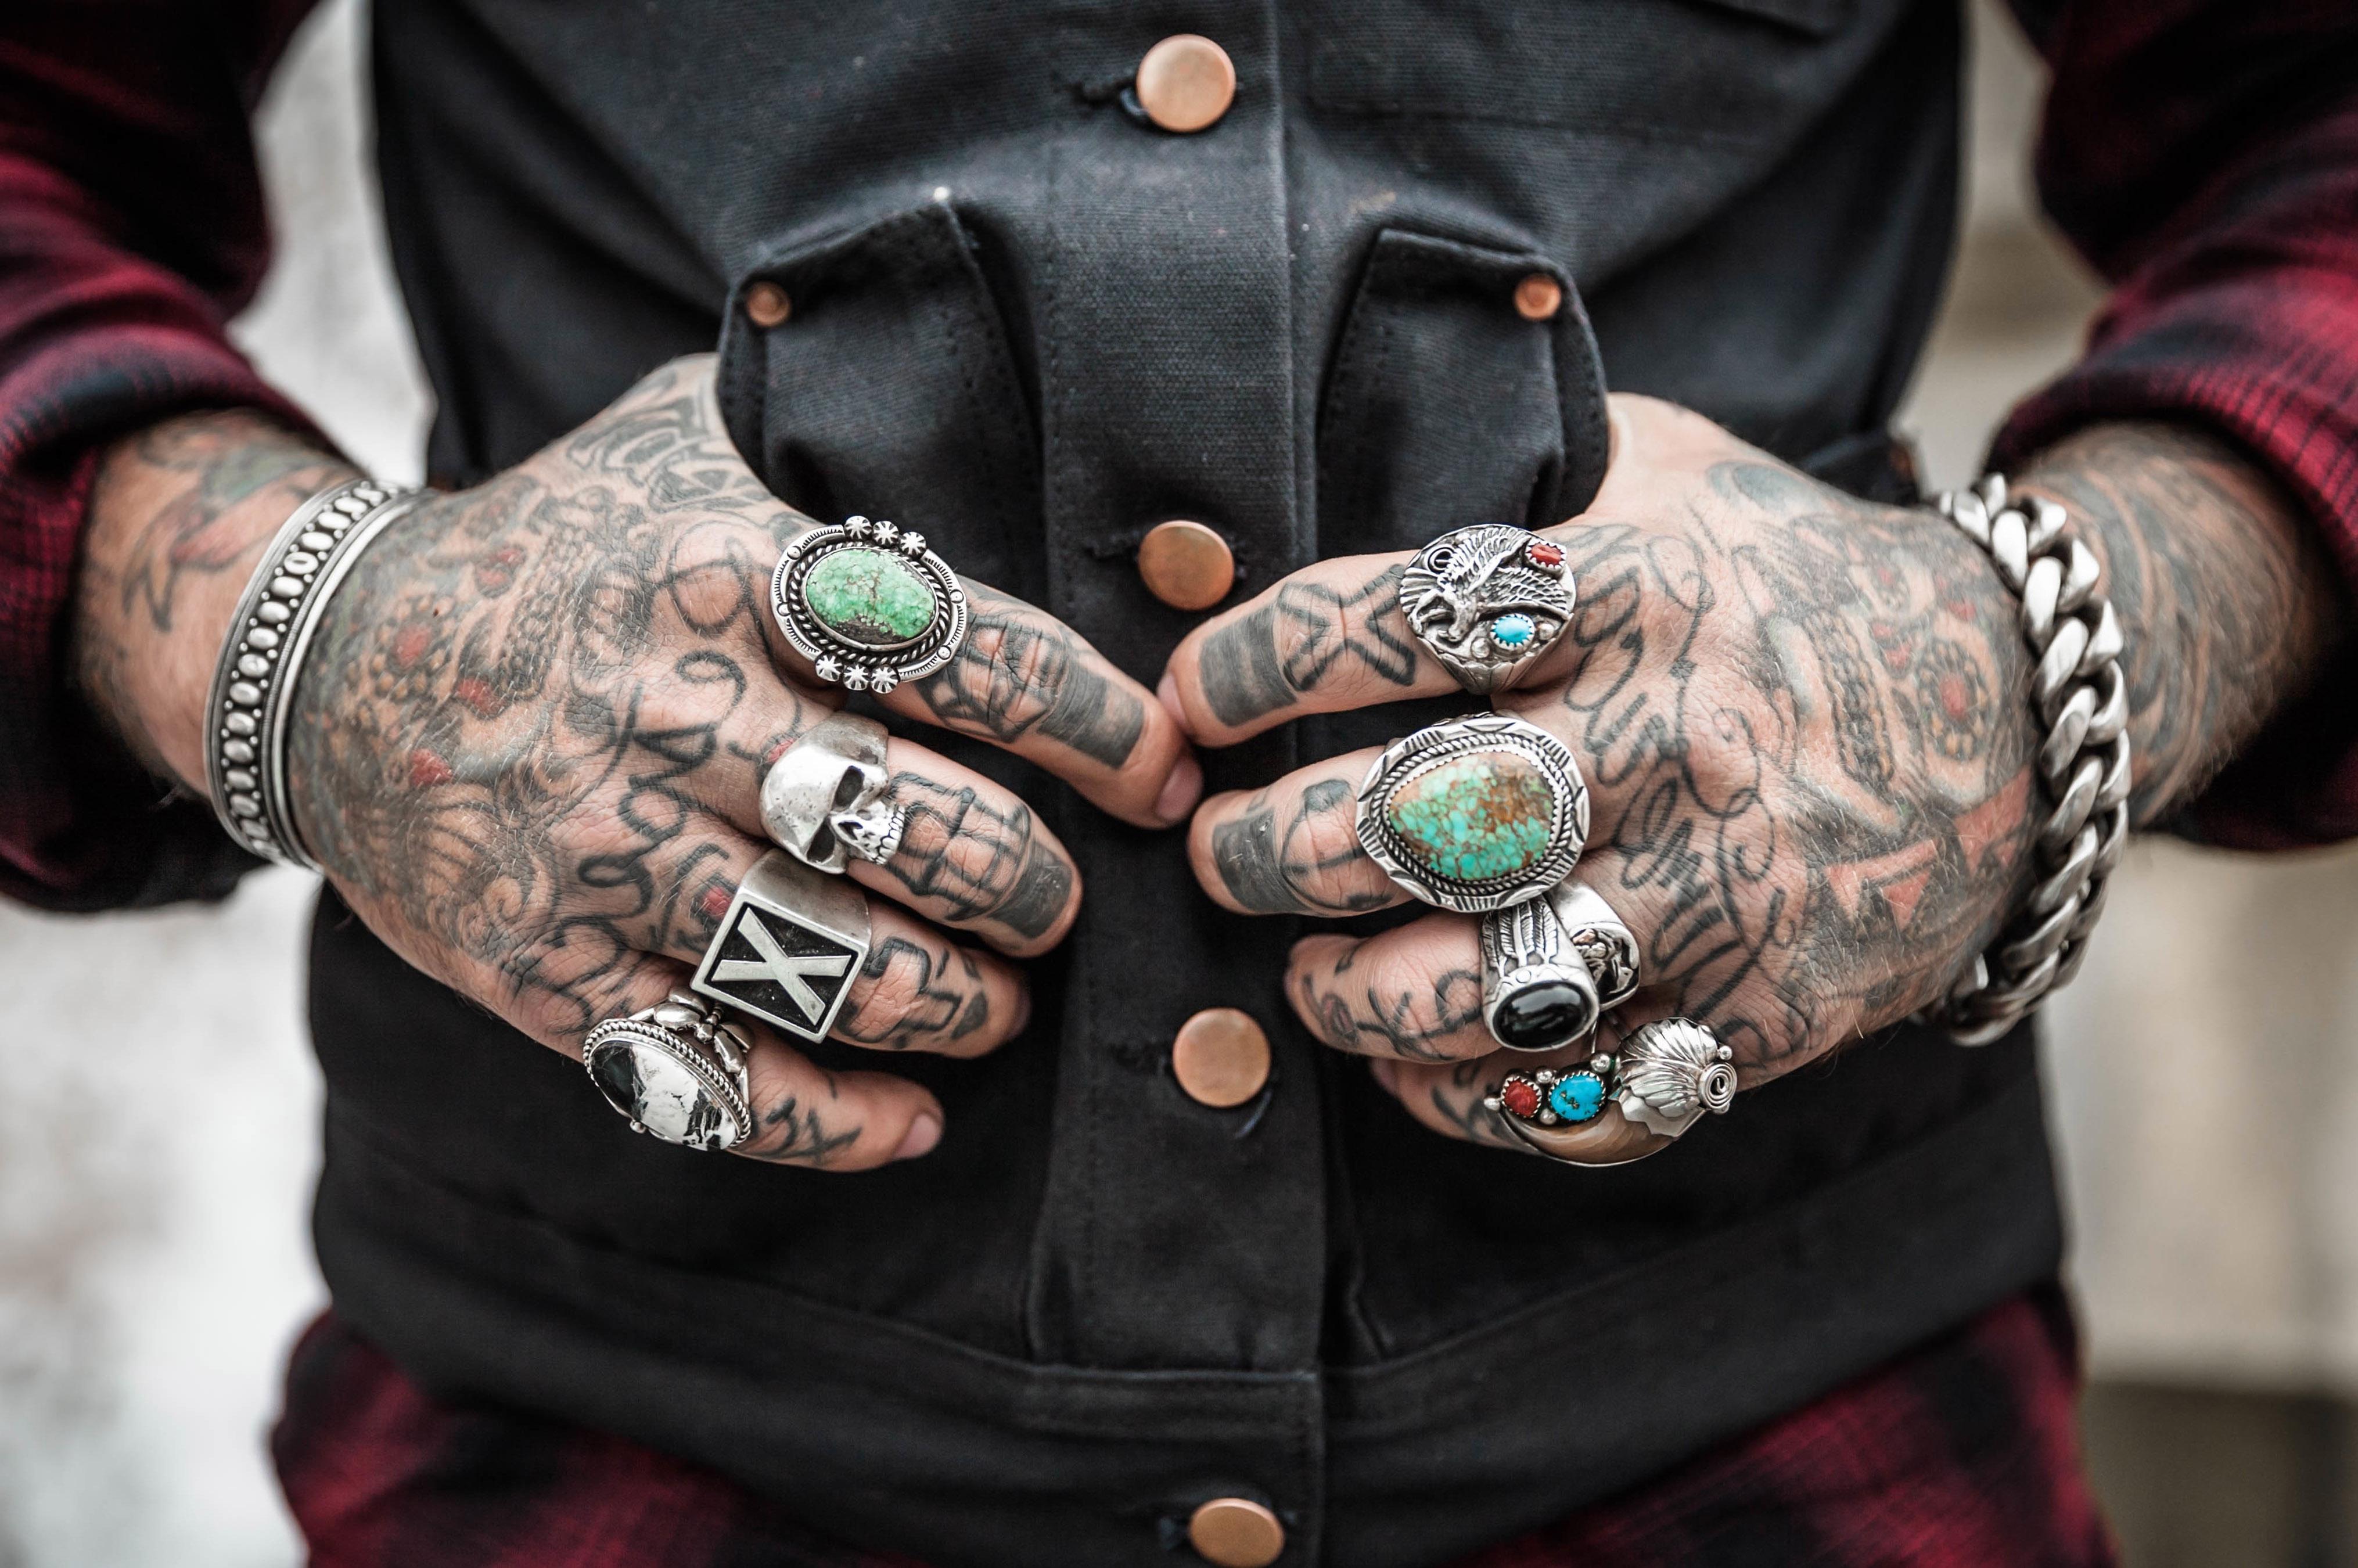 HDoboi.Kiev.ua - Мужские татуировки тату на руке надпись